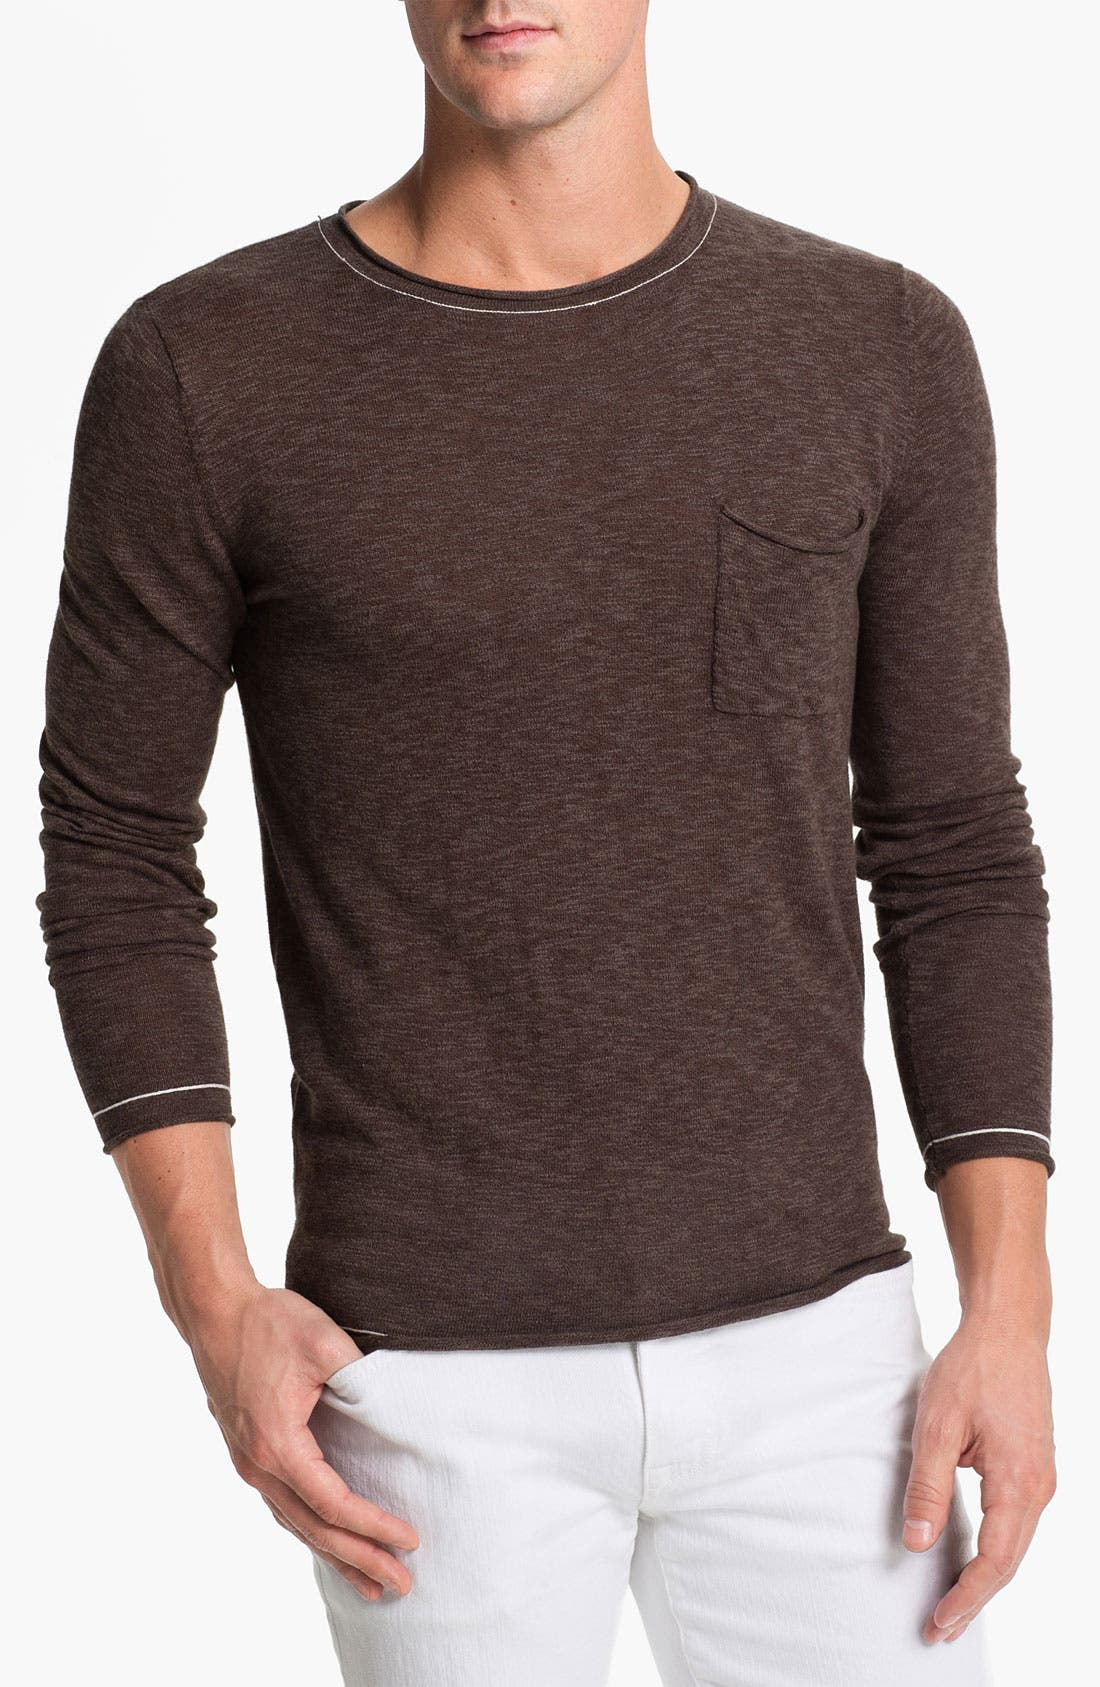 Alternate Image 1 Selected - Antony Morato Slub Crewneck Sweater